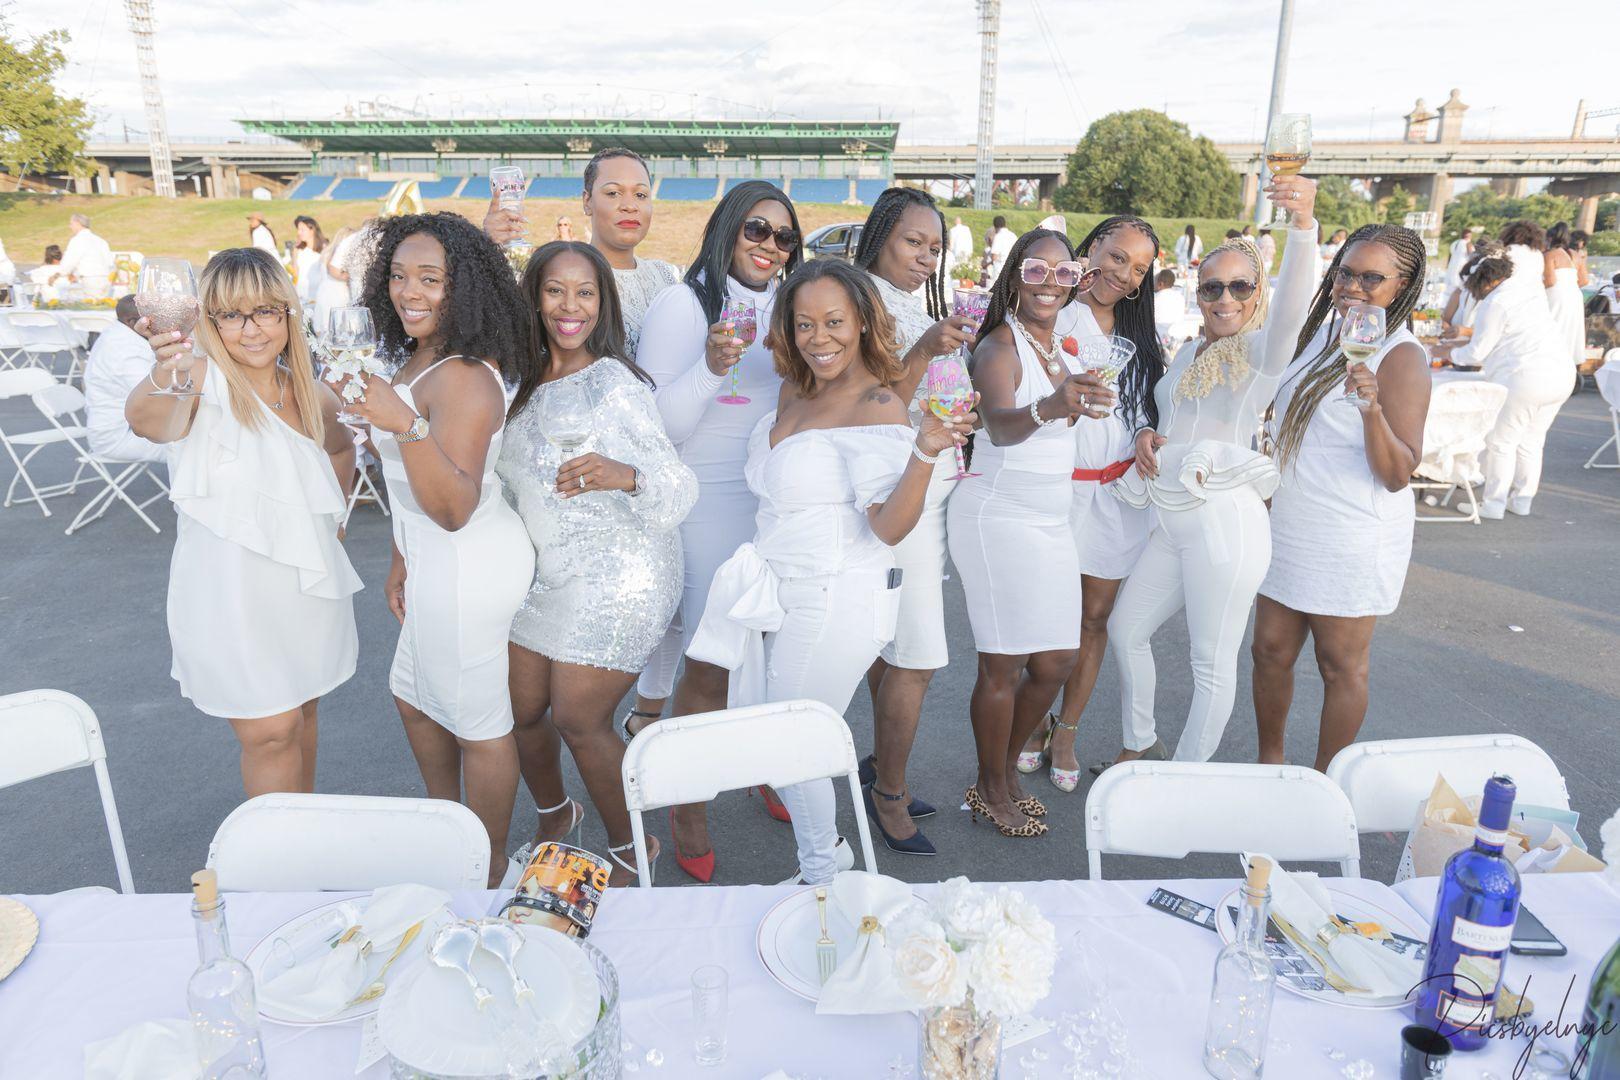 Soiree en Blanc - a Gala in White